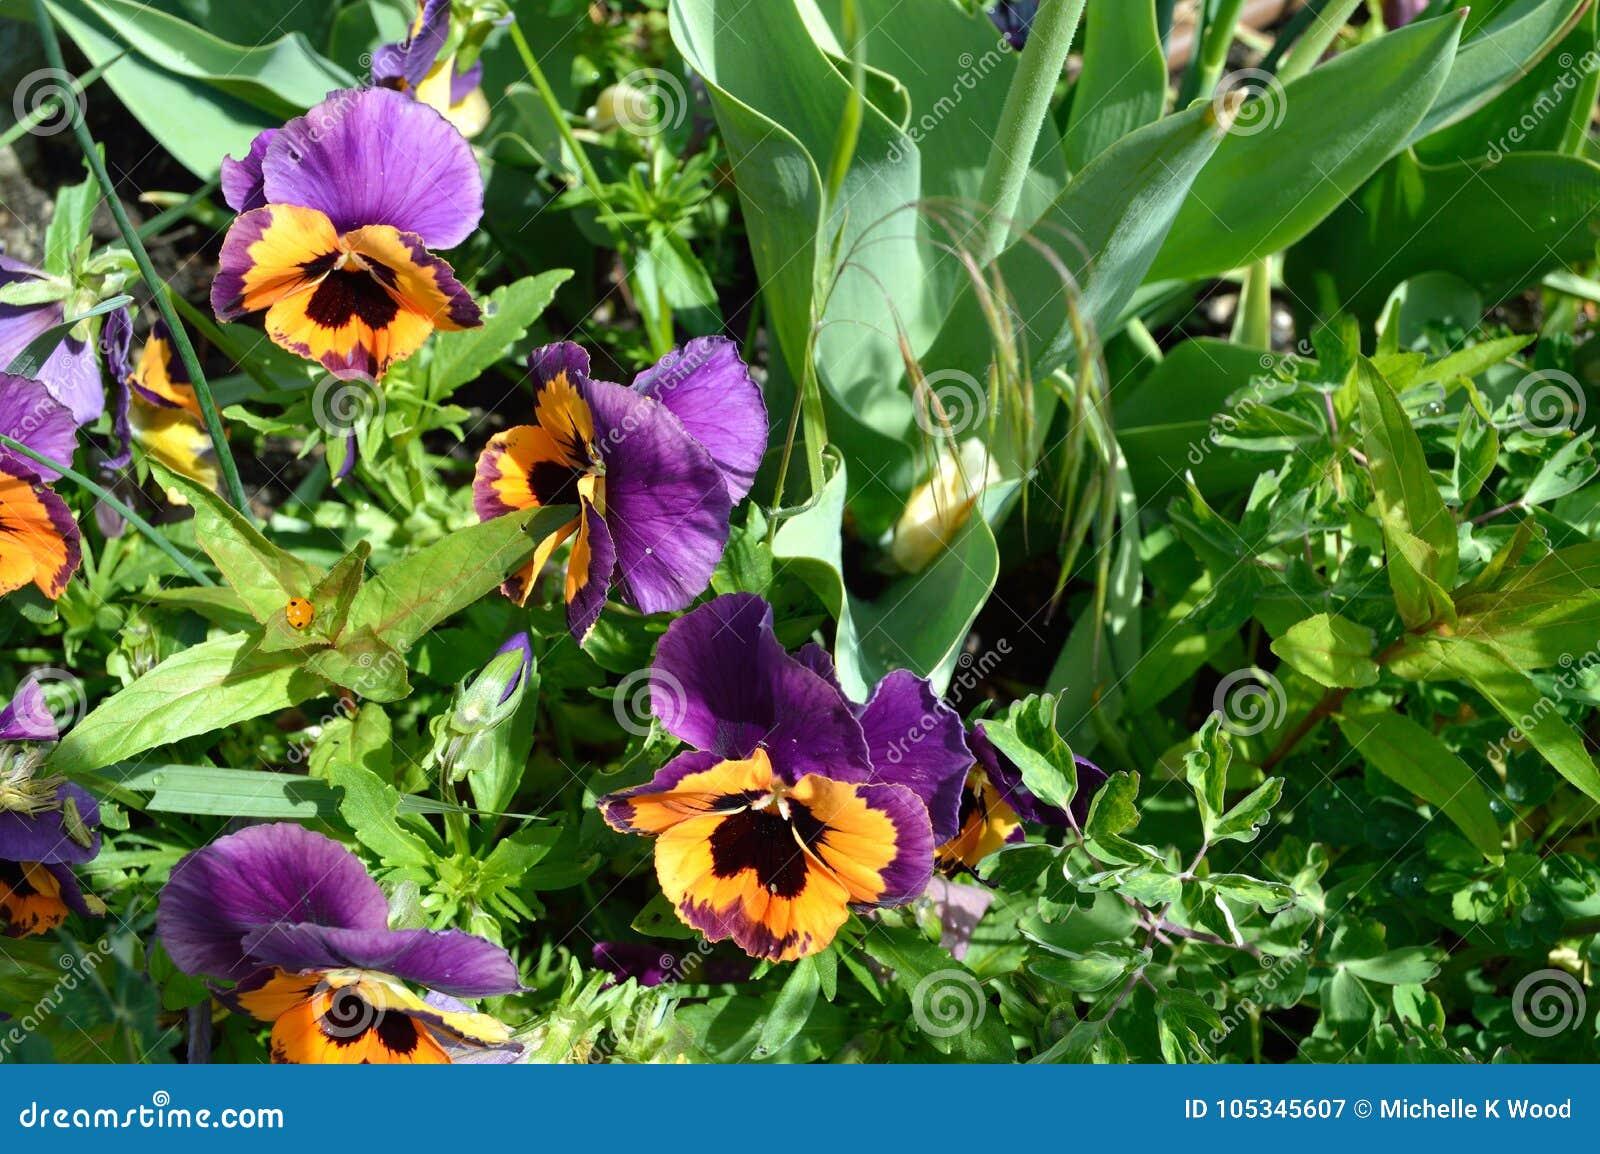 Inspire Purple and Orange Pansy